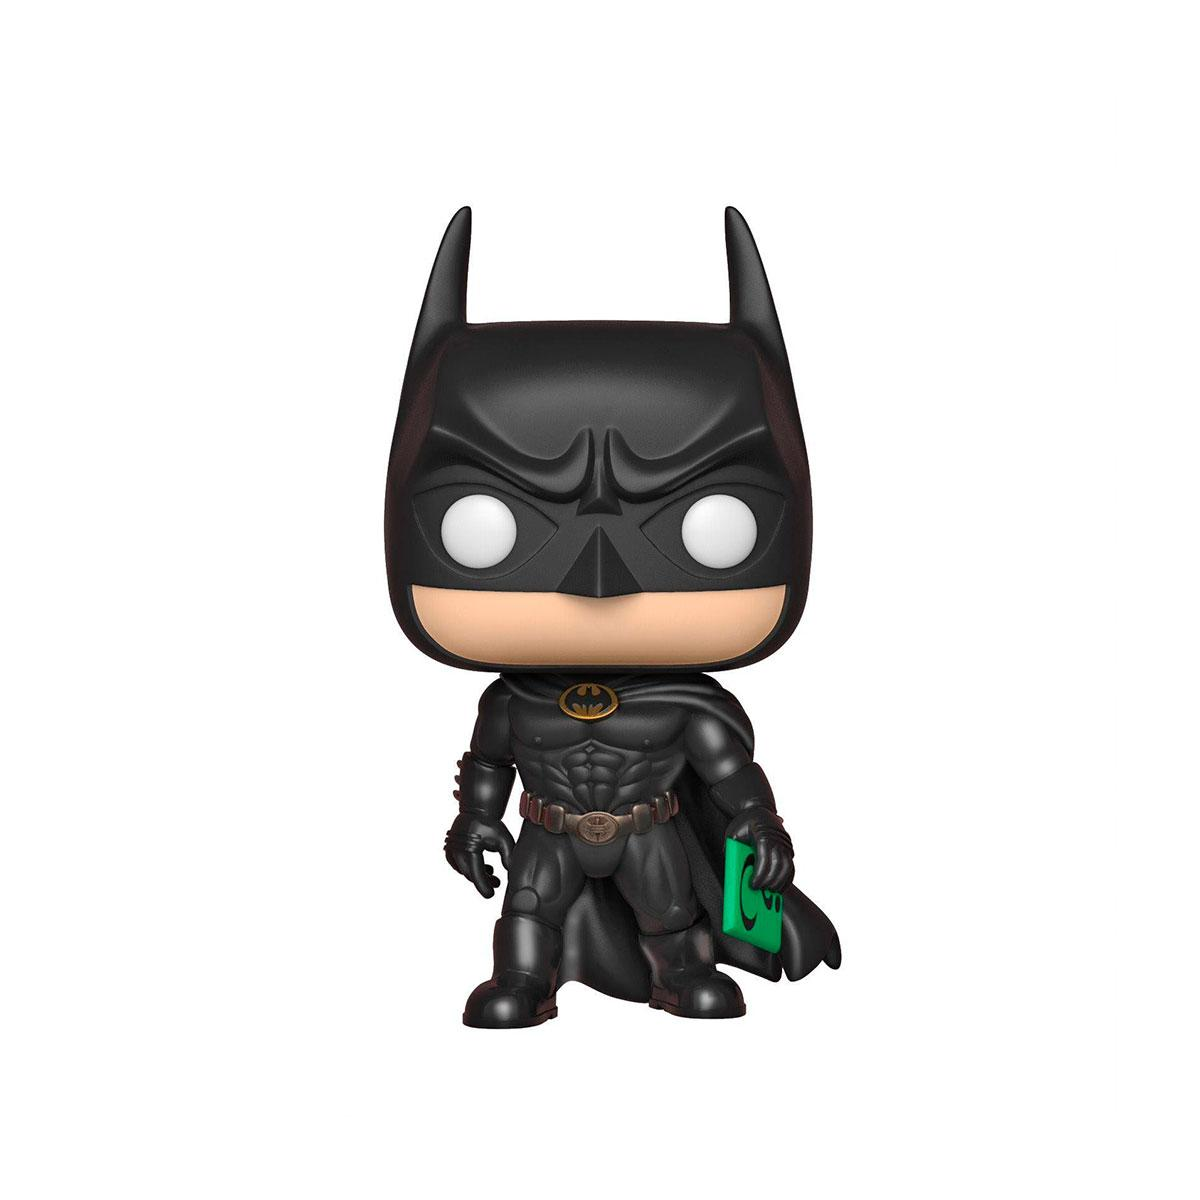 Funko Pop! Игровая фигурка Бэтмен - серии Бэтмен 80-Е, 37254